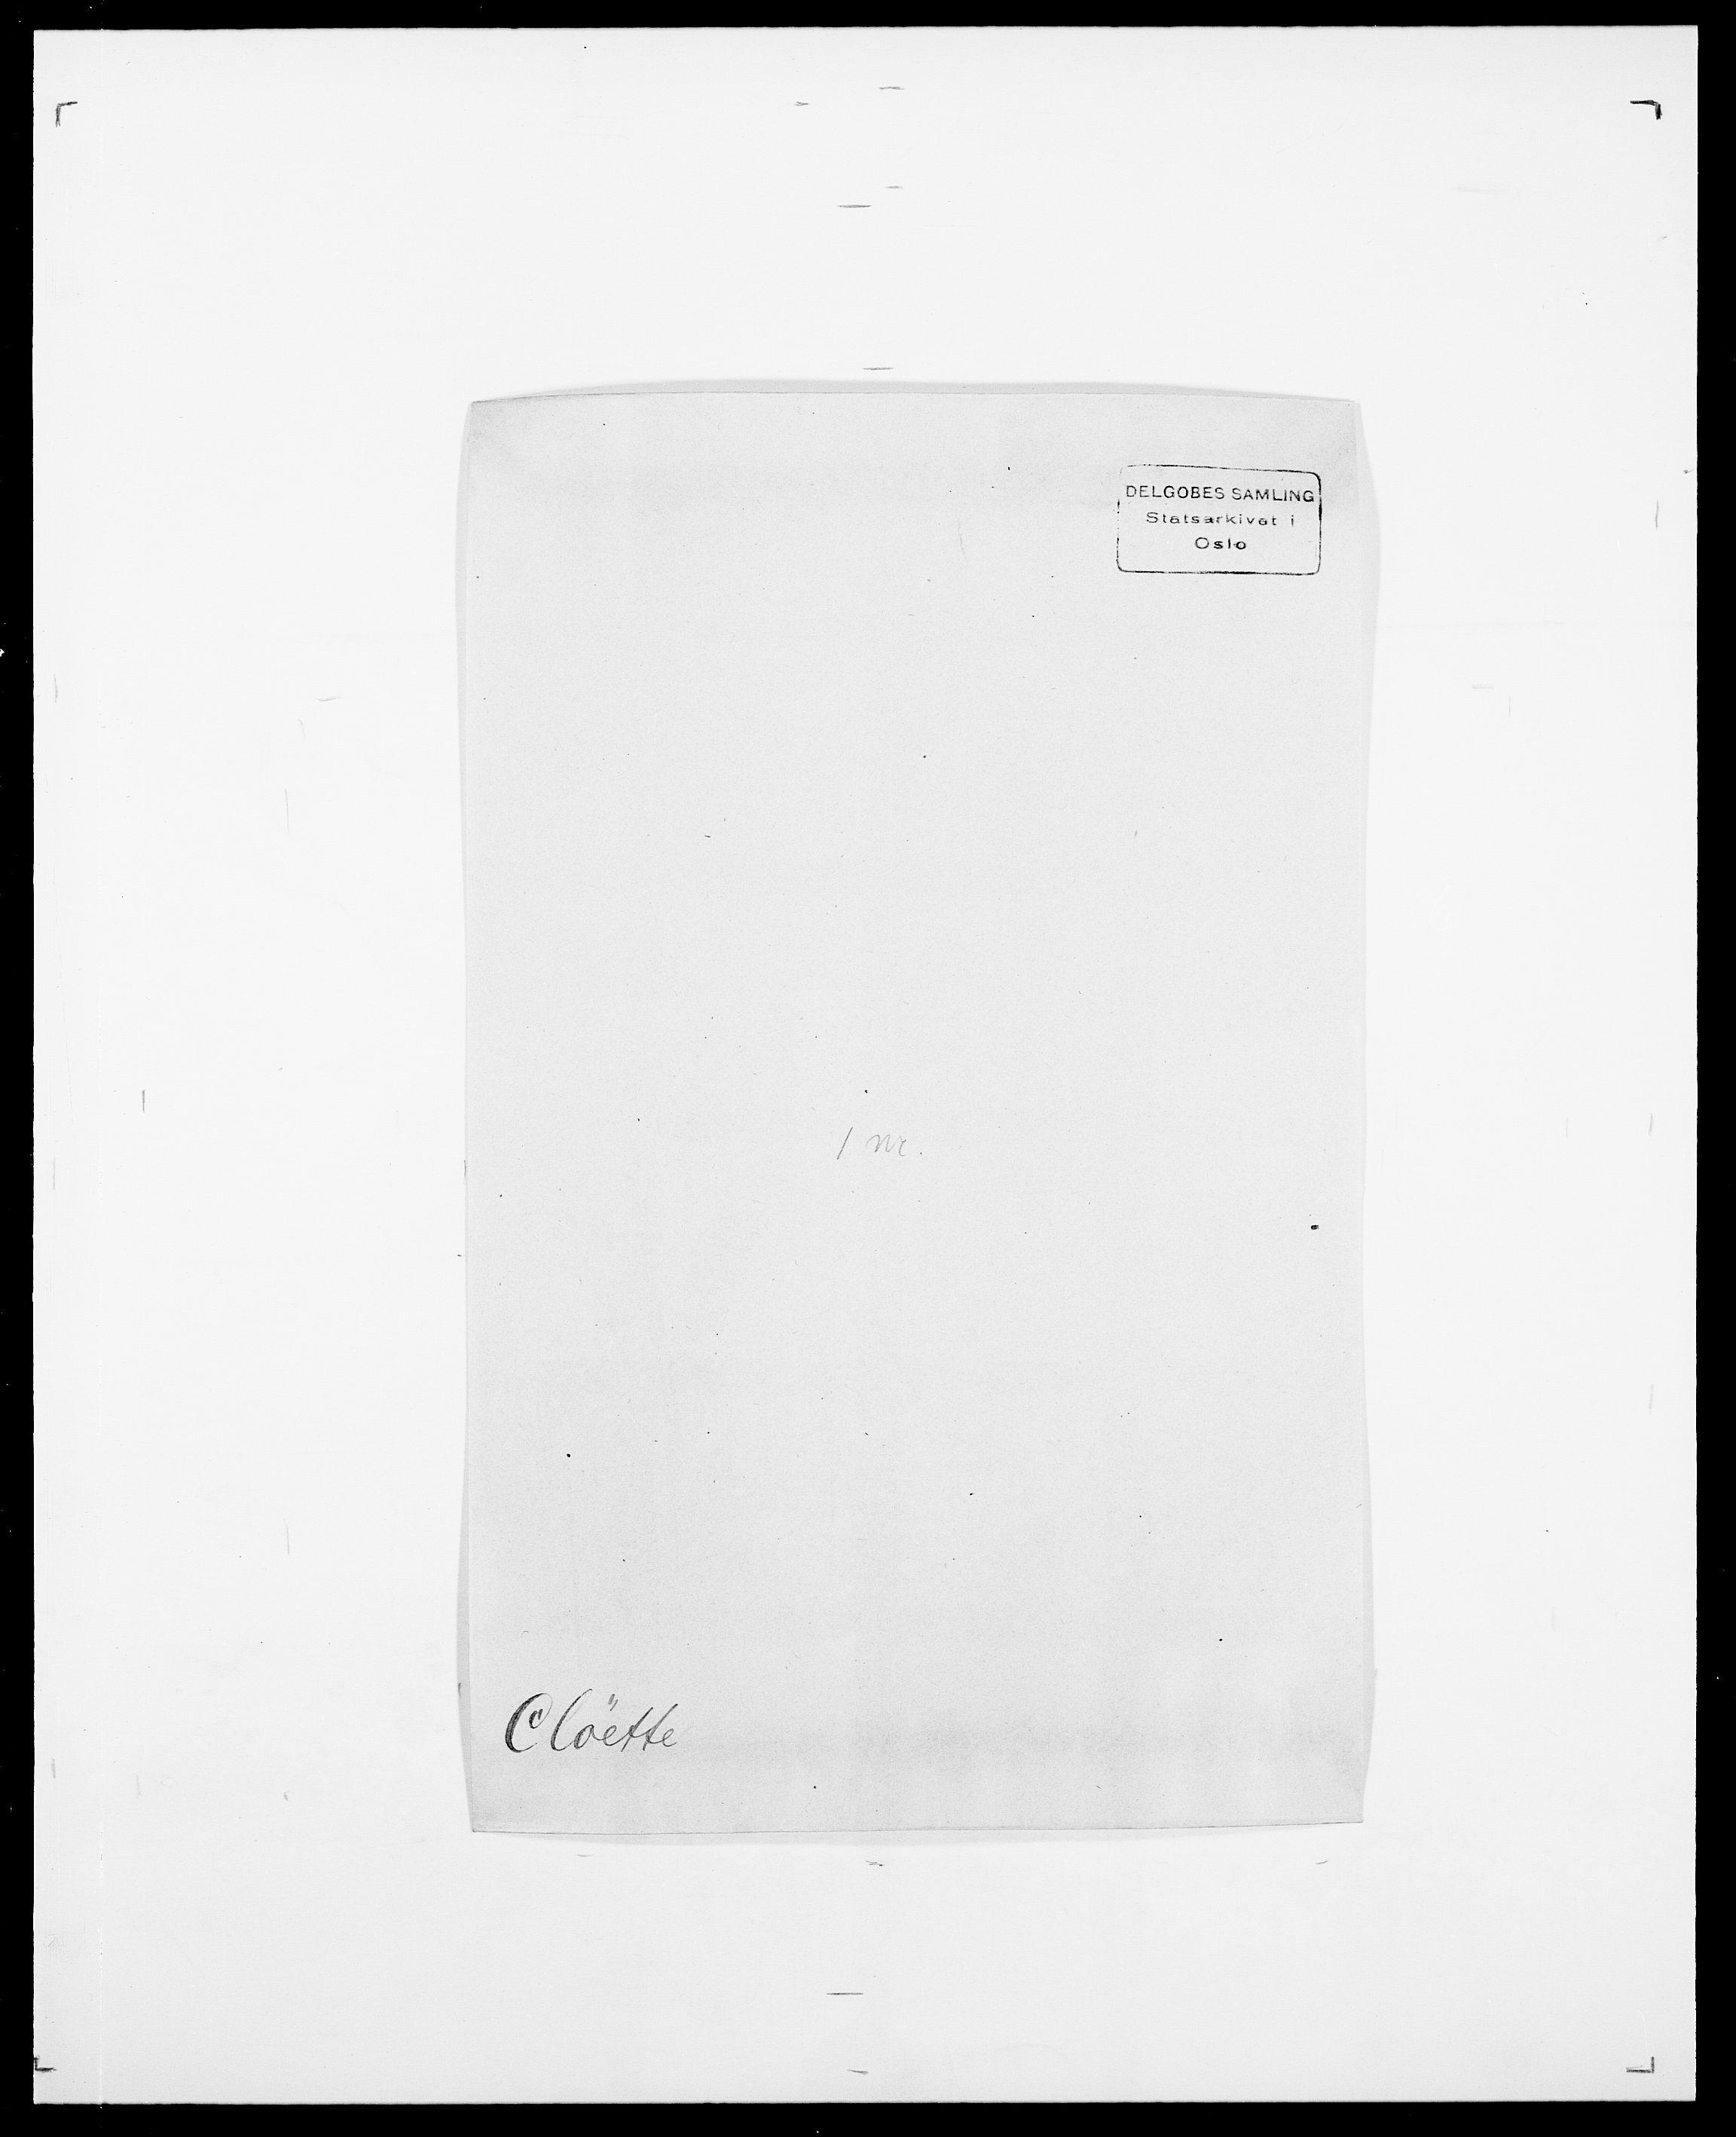 SAO, Delgobe, Charles Antoine - samling, D/Da/L0008: Capjon - Dagenbolt, s. 393